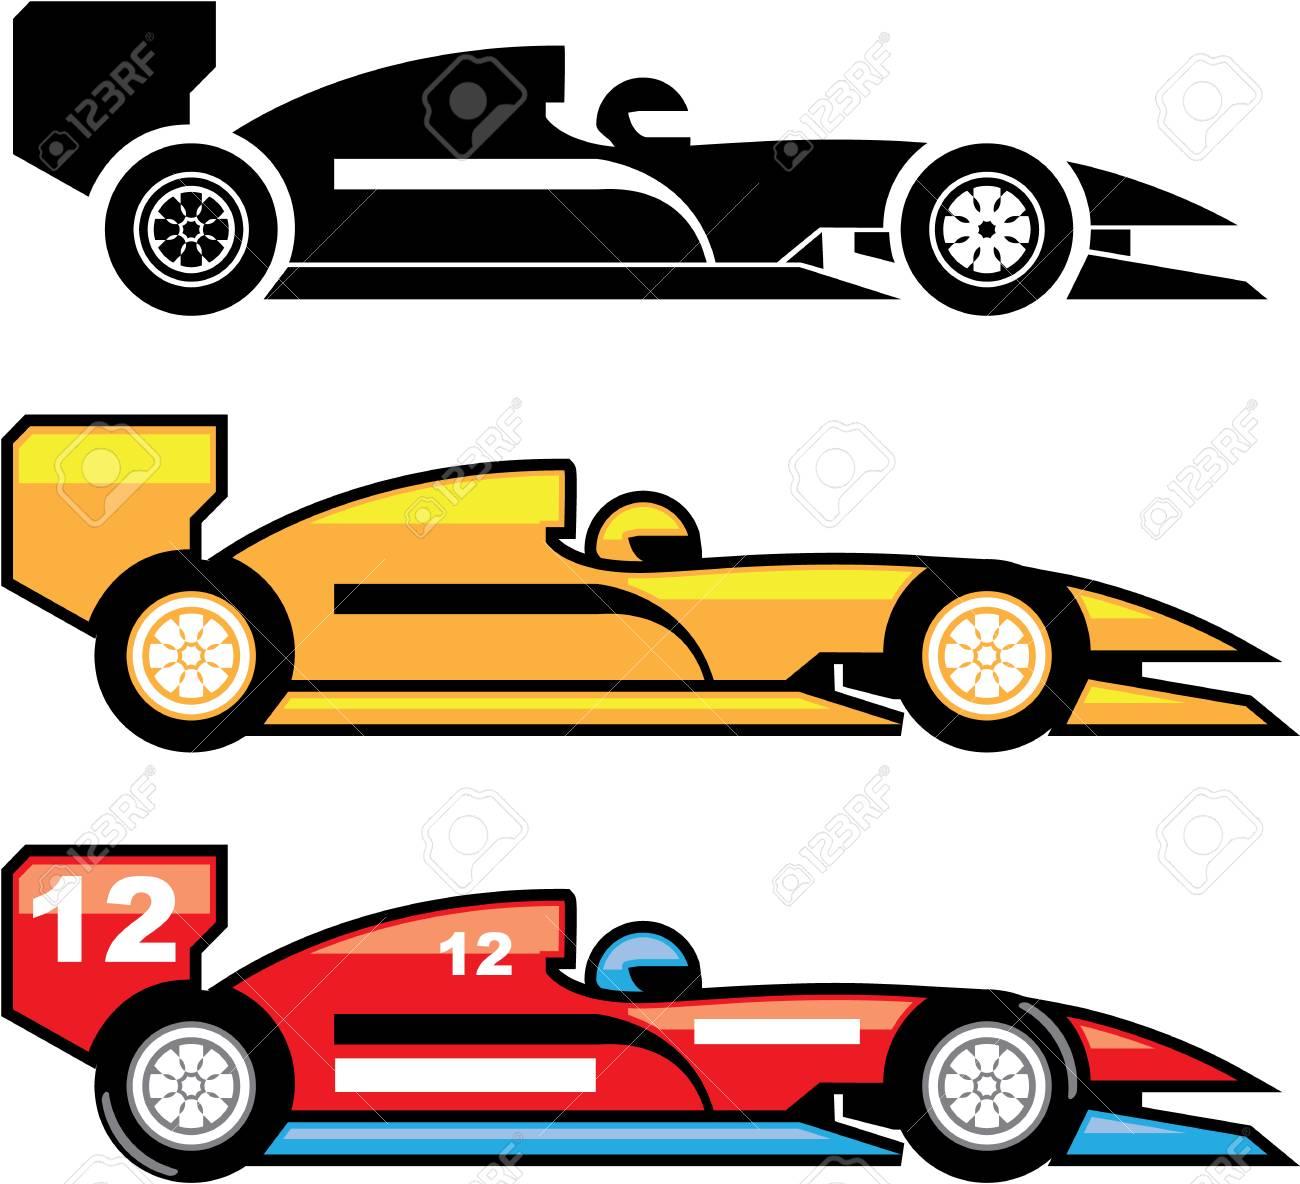 formula racing car vector illustration clip art image royalty free rh 123rf com car vector png car vector png